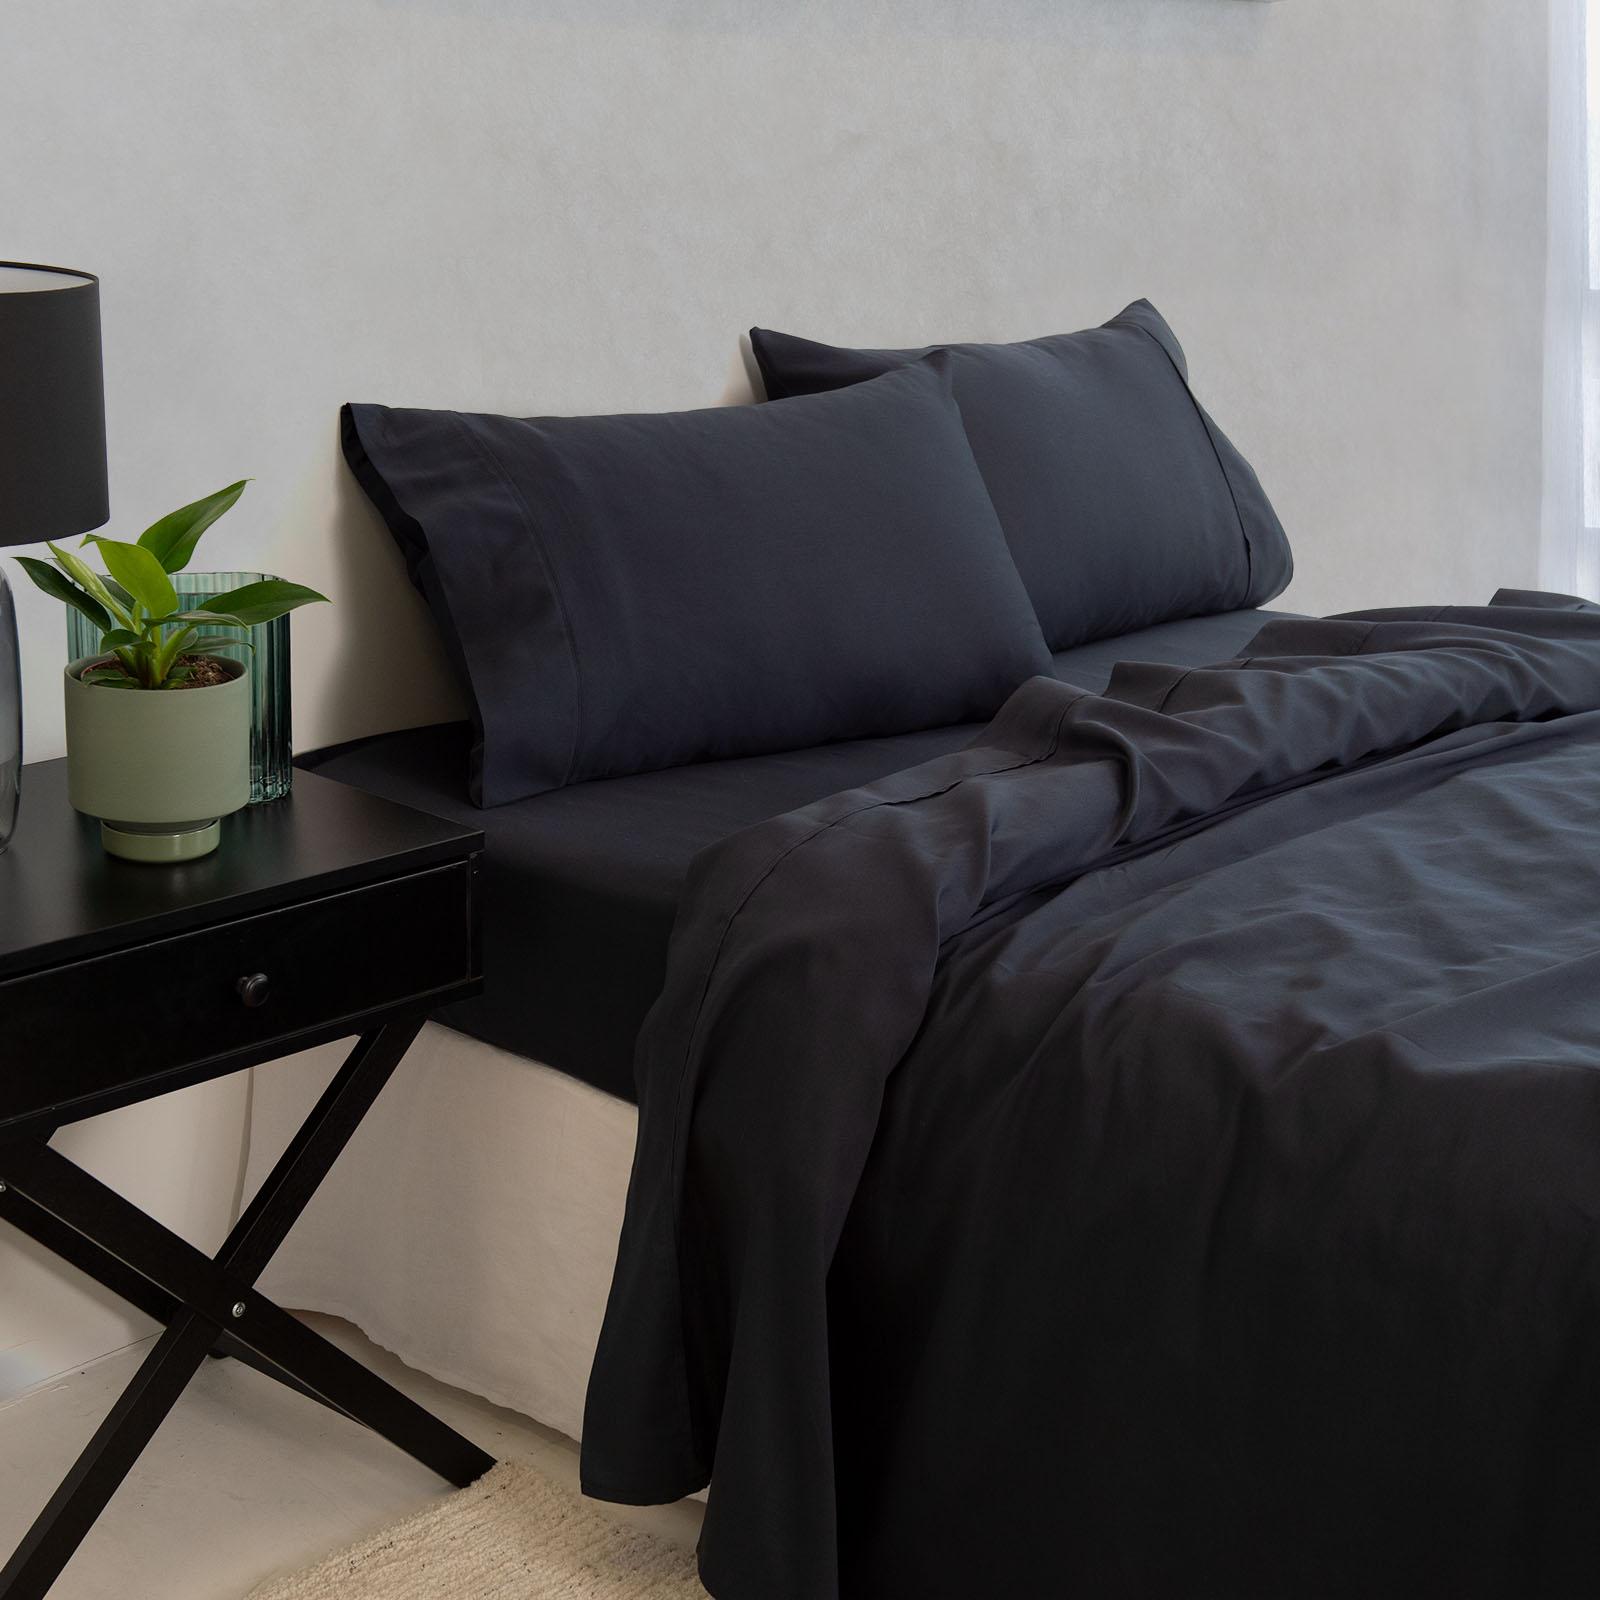 thumbnail 26 - Royal Comfort 1000TC Hotel Grade Bamboo Cotton Sheets Pillowcases Set Ultrasoft